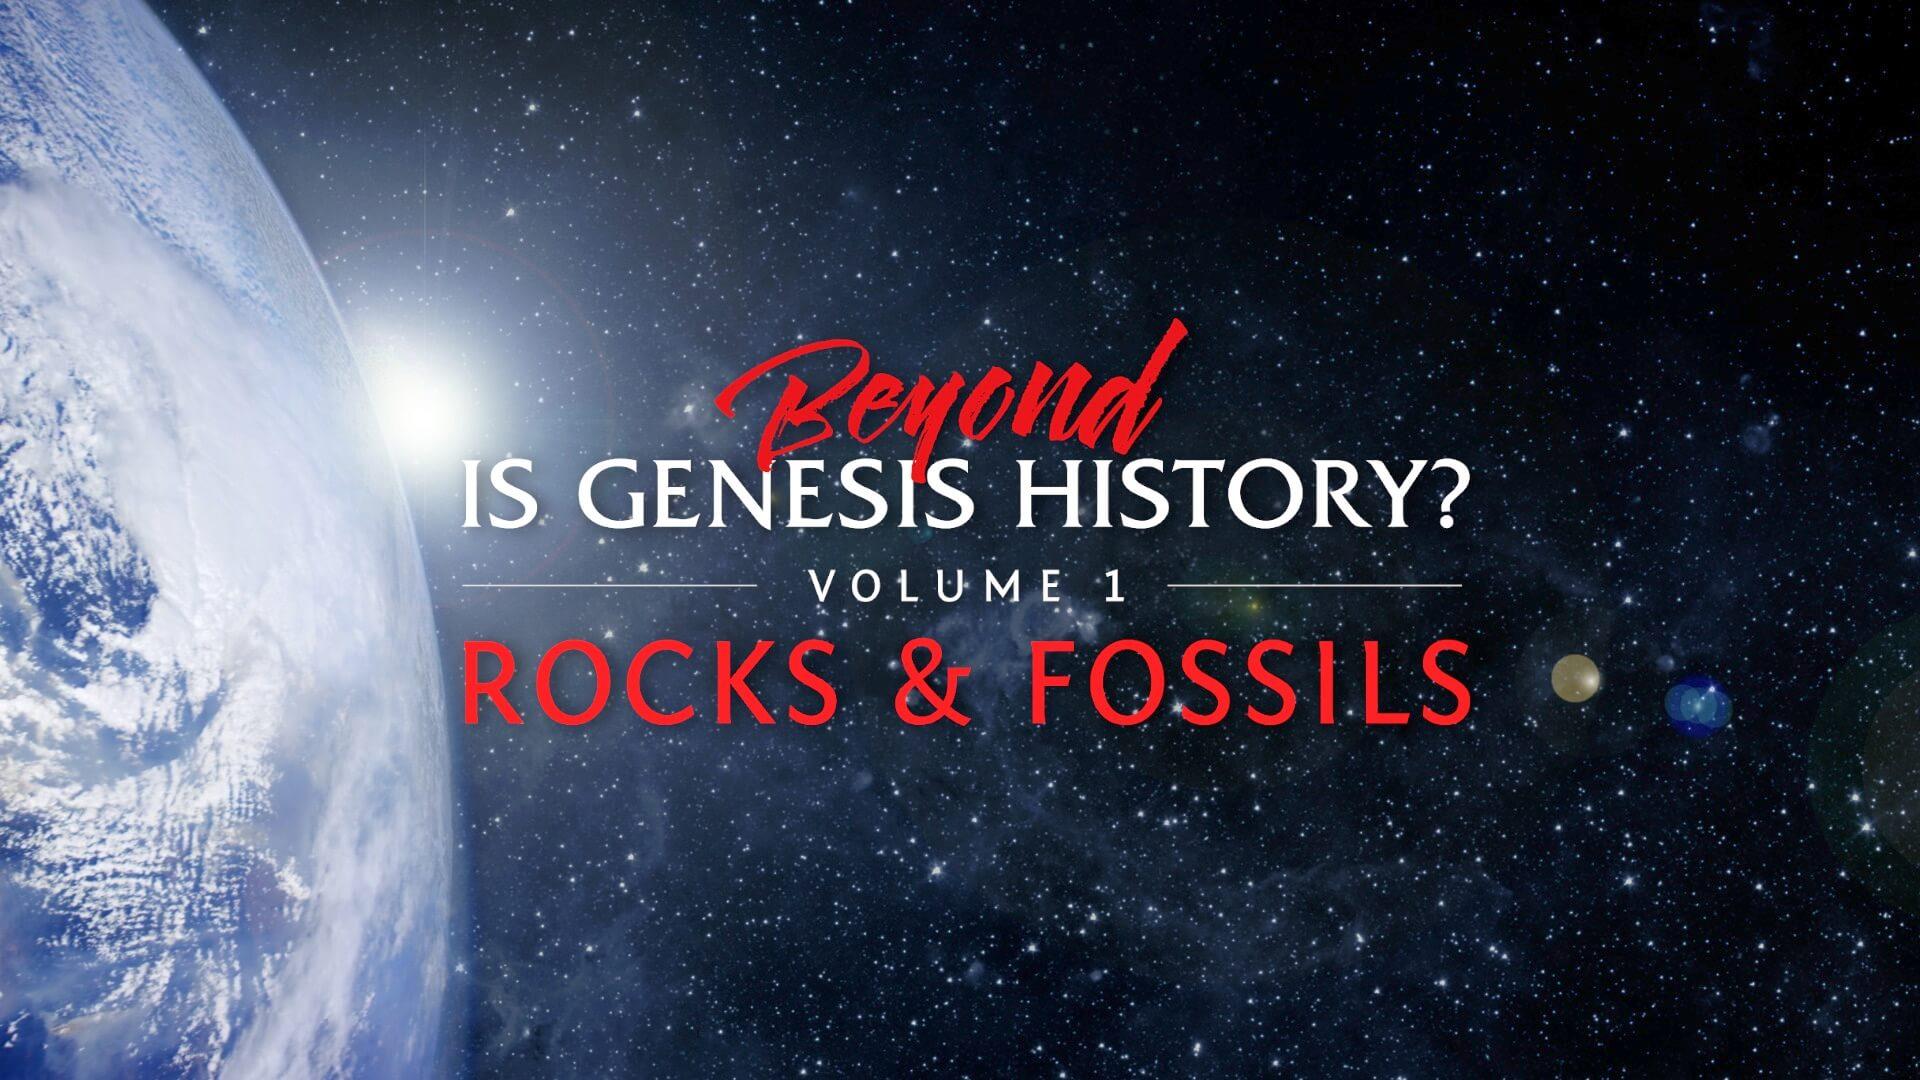 Genesis carbon dating